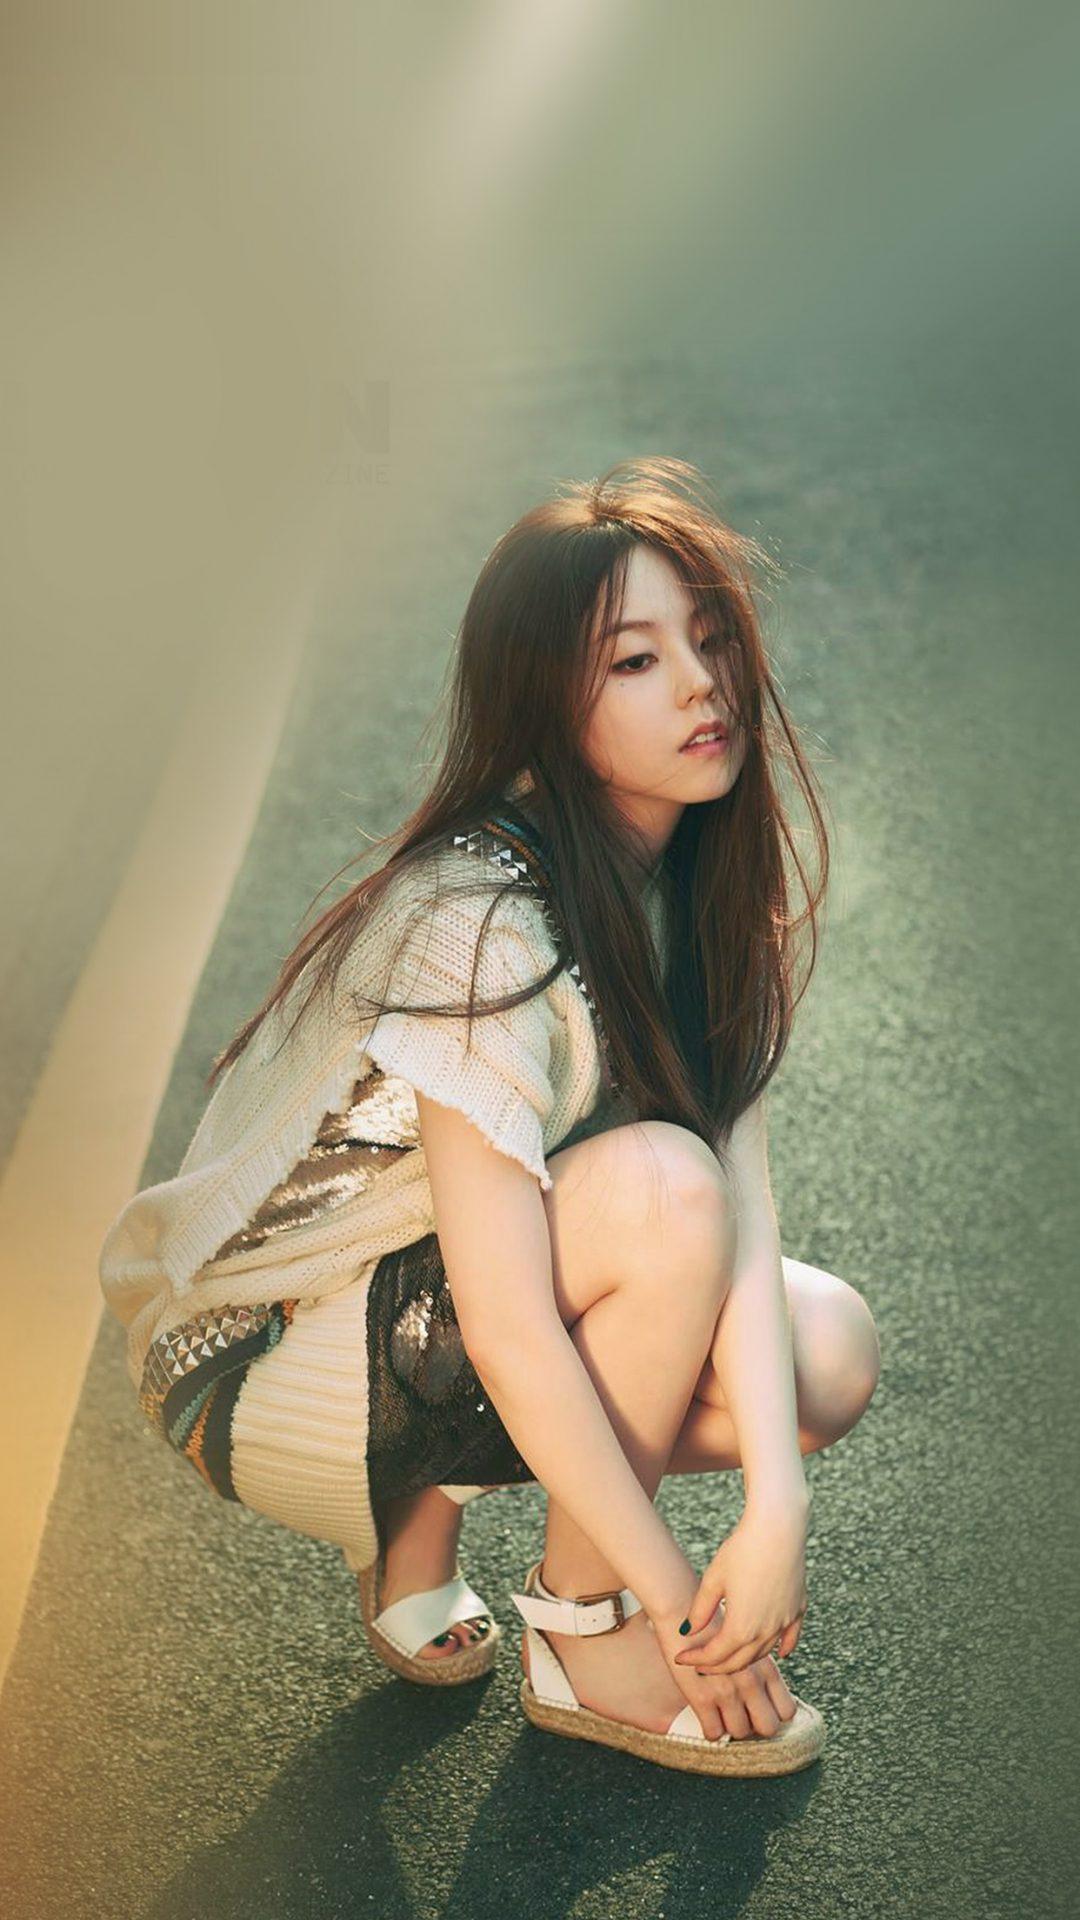 Kpop Sohee Street Girl Celebrity